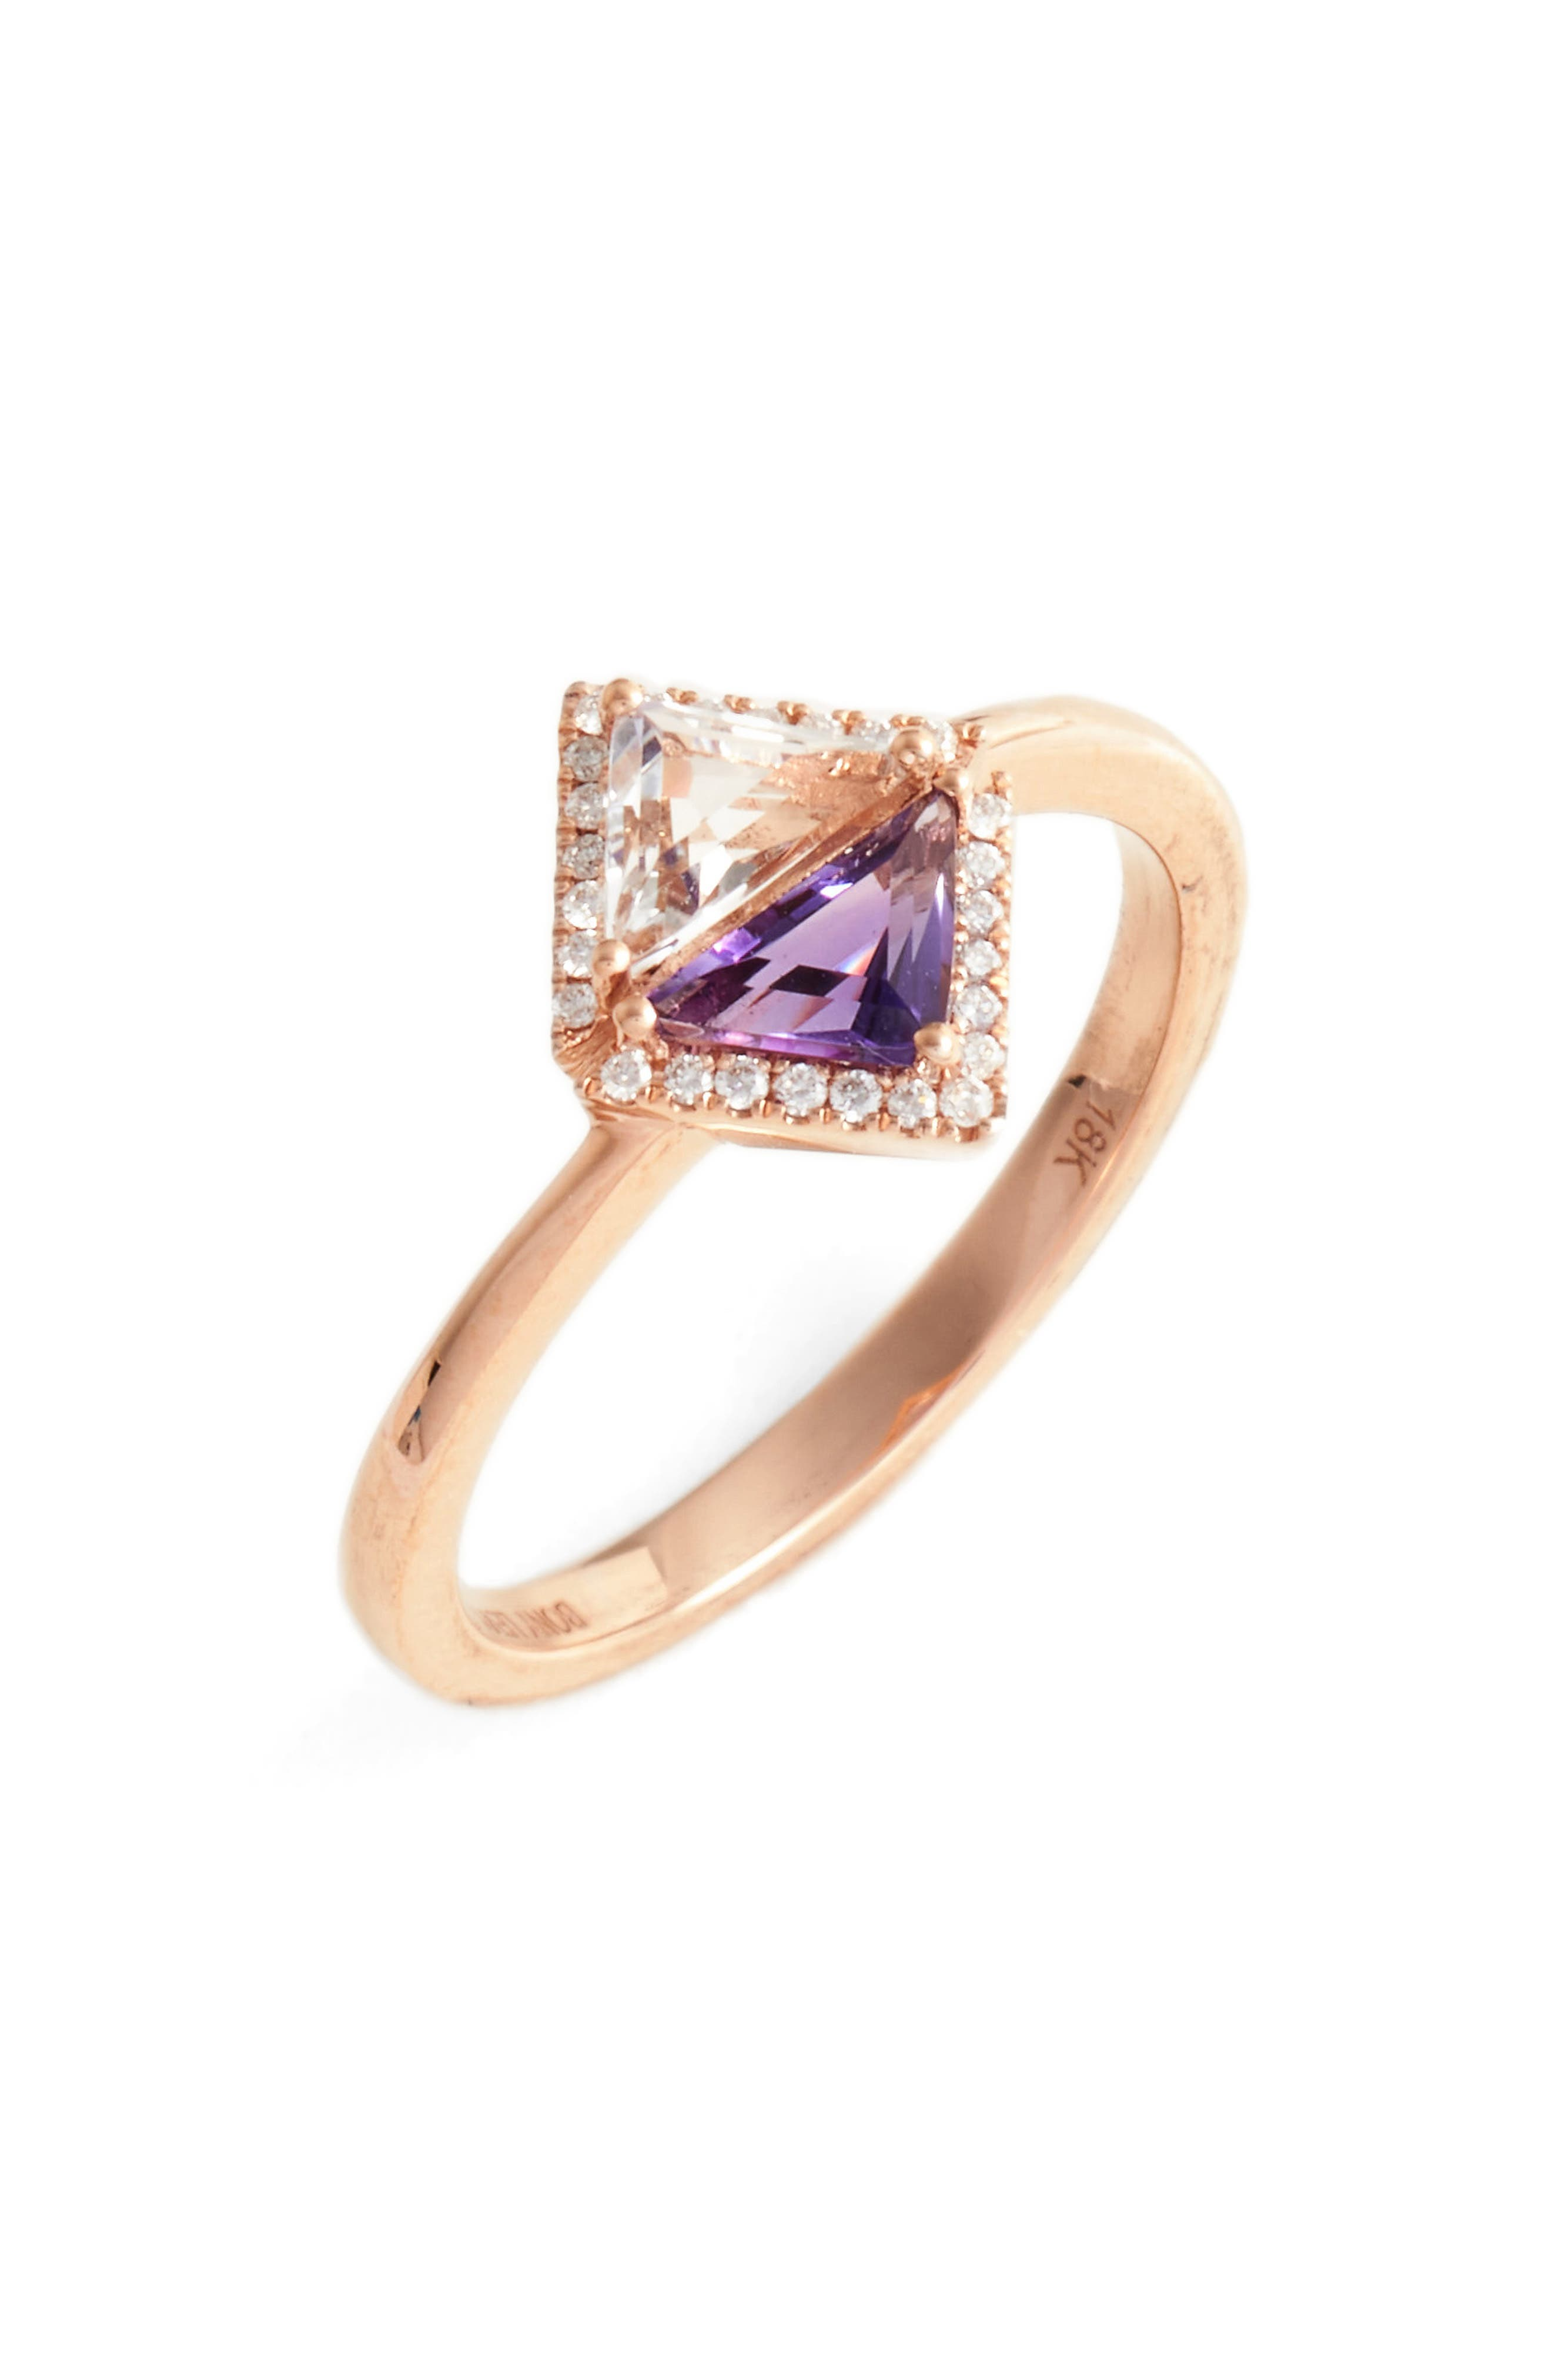 Iris Double Triangle Diamond & Semiprecious Stone Ring,                         Main,                         color, White Topaz/ Amethyst